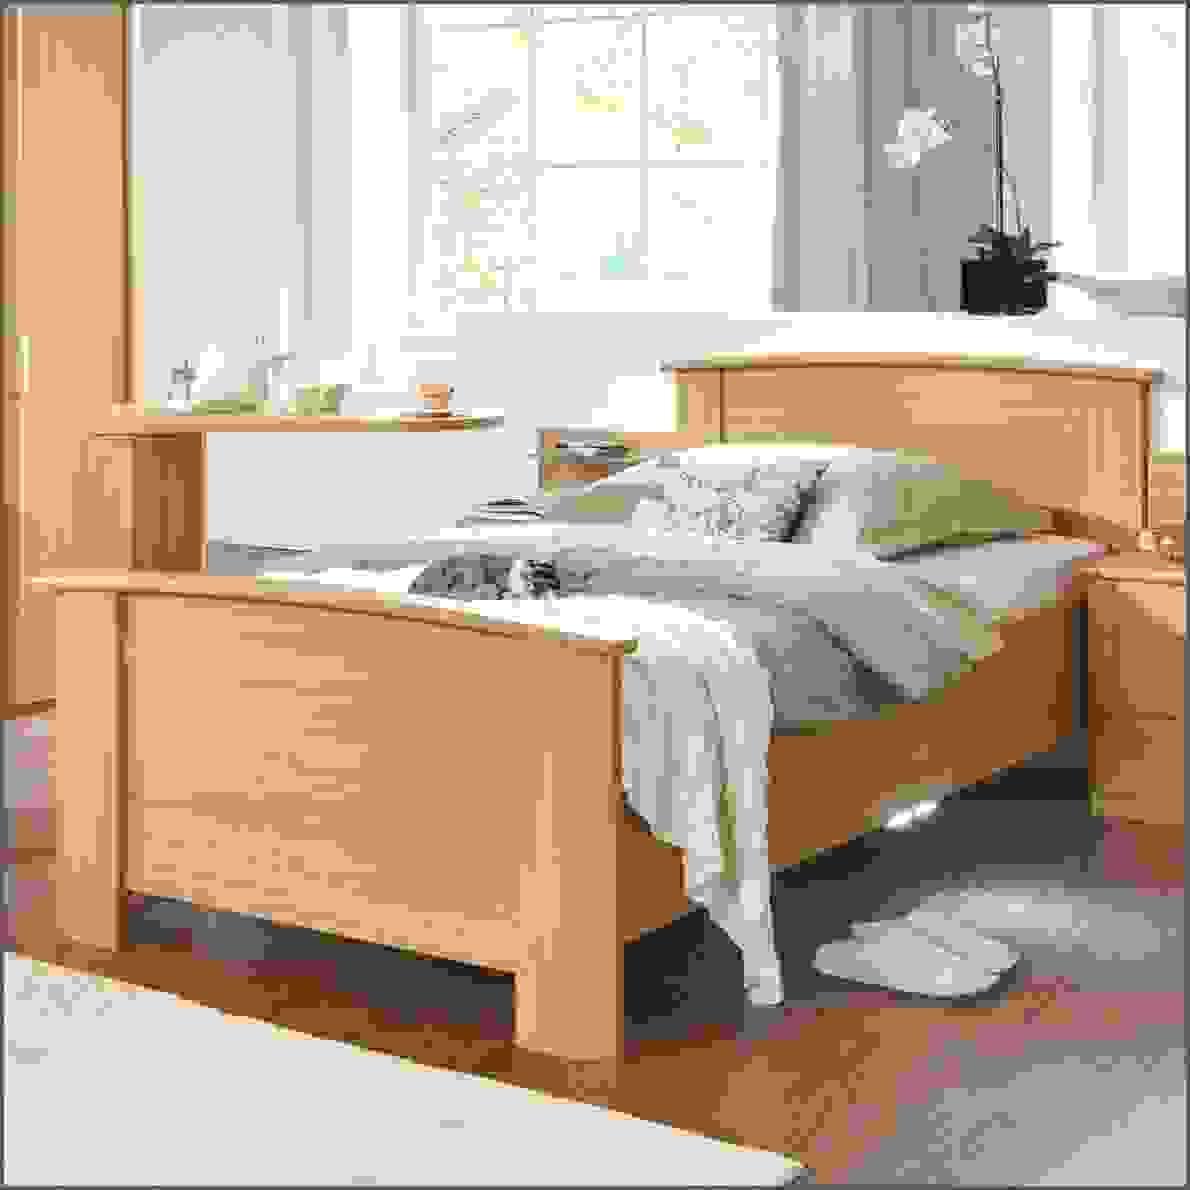 Seniorenbett 120X200 Nett Seniorenbett Holzbett Massivholz Kiefer von Seniorenbett 120X200 Mit Bettkasten Bild